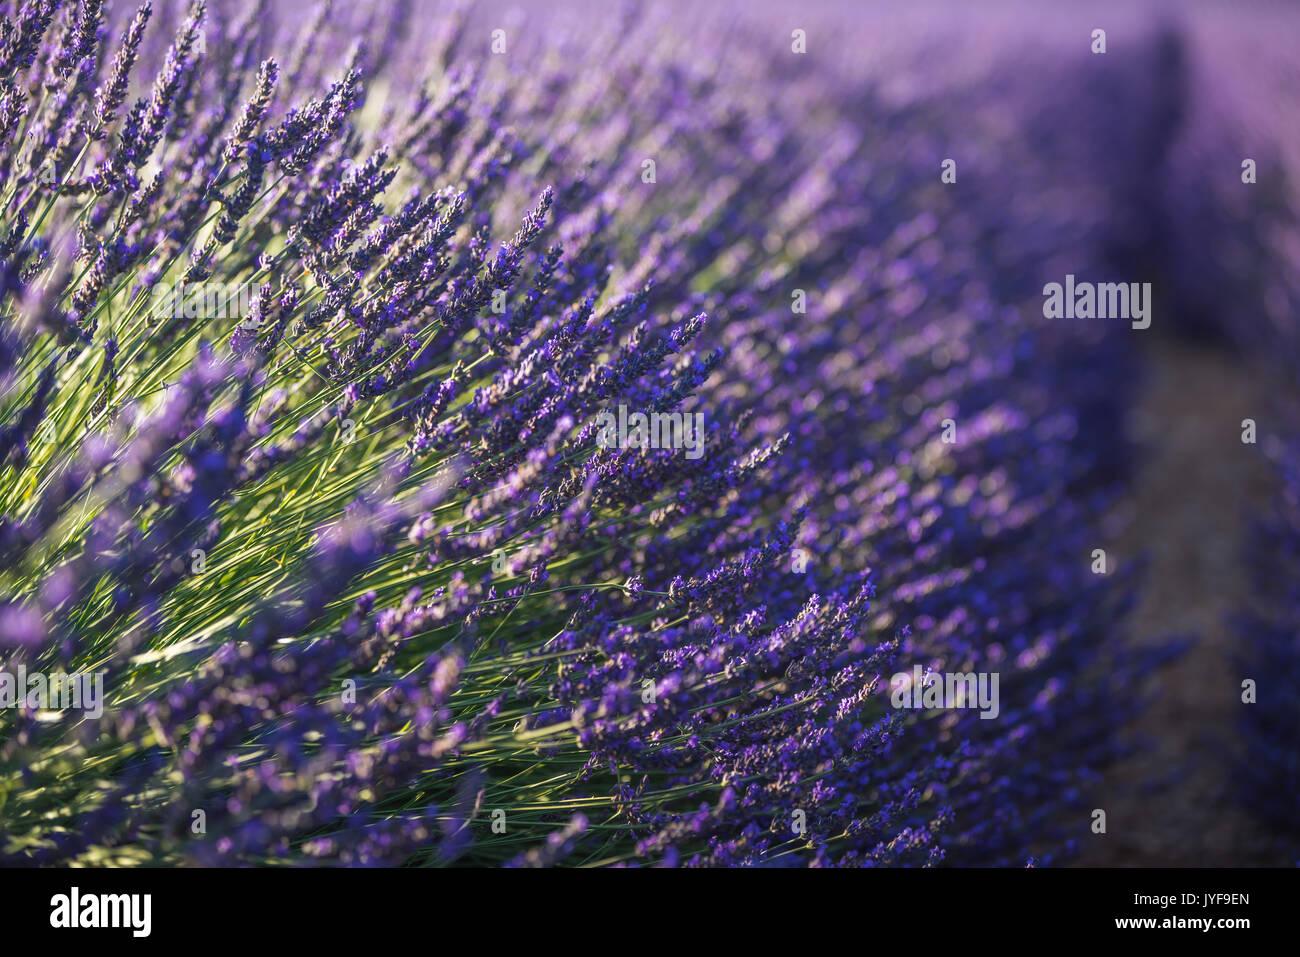 Lavender close-up, Valensole, Alpes, France Photo Stock